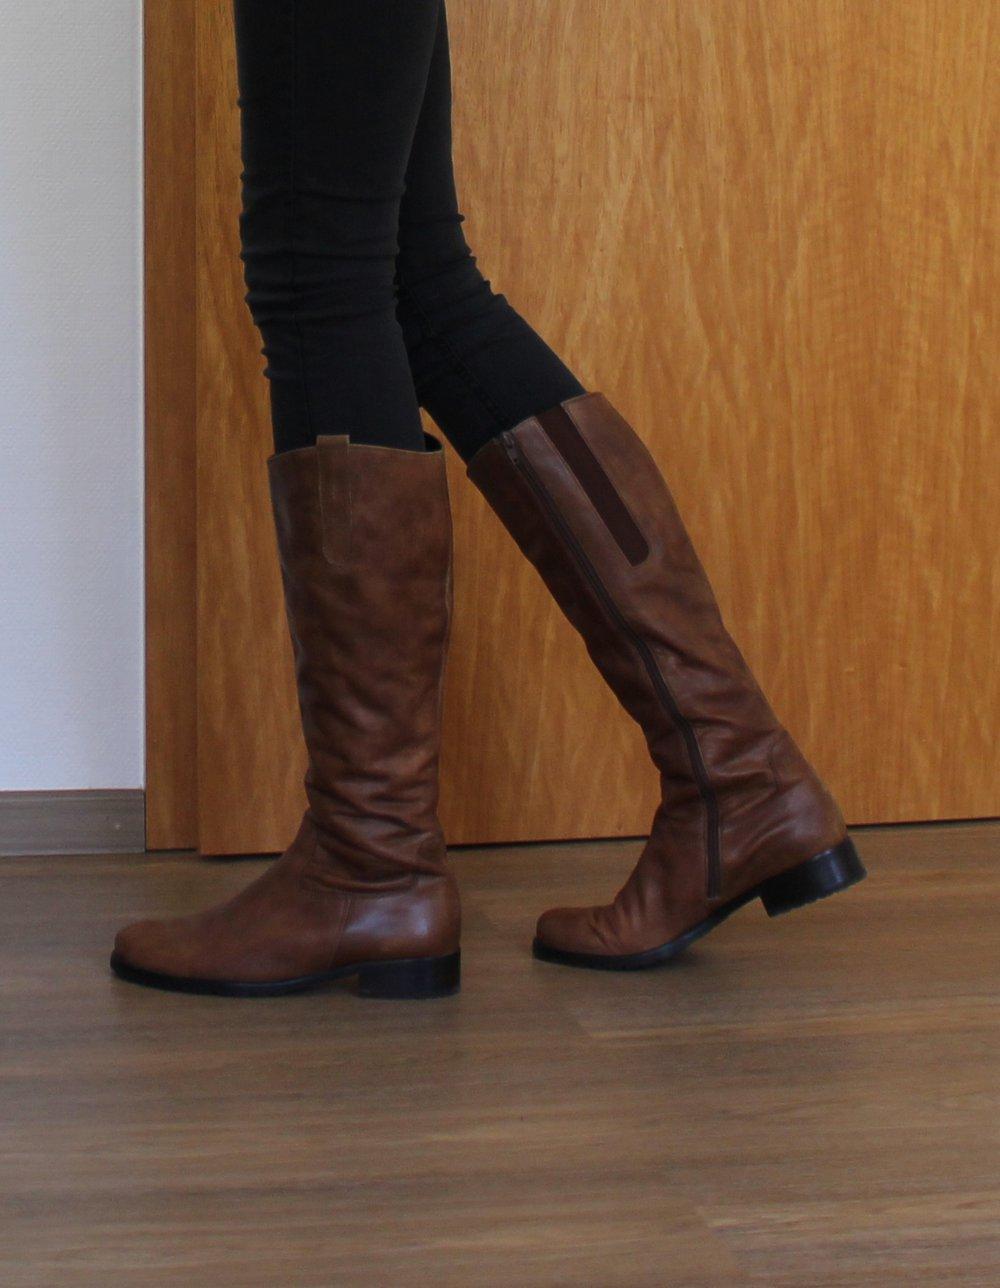 36114b5b5cf Damen Leder Stiefel braun Gabor (Neupreis 140€) :: Kleiderkorb.ch